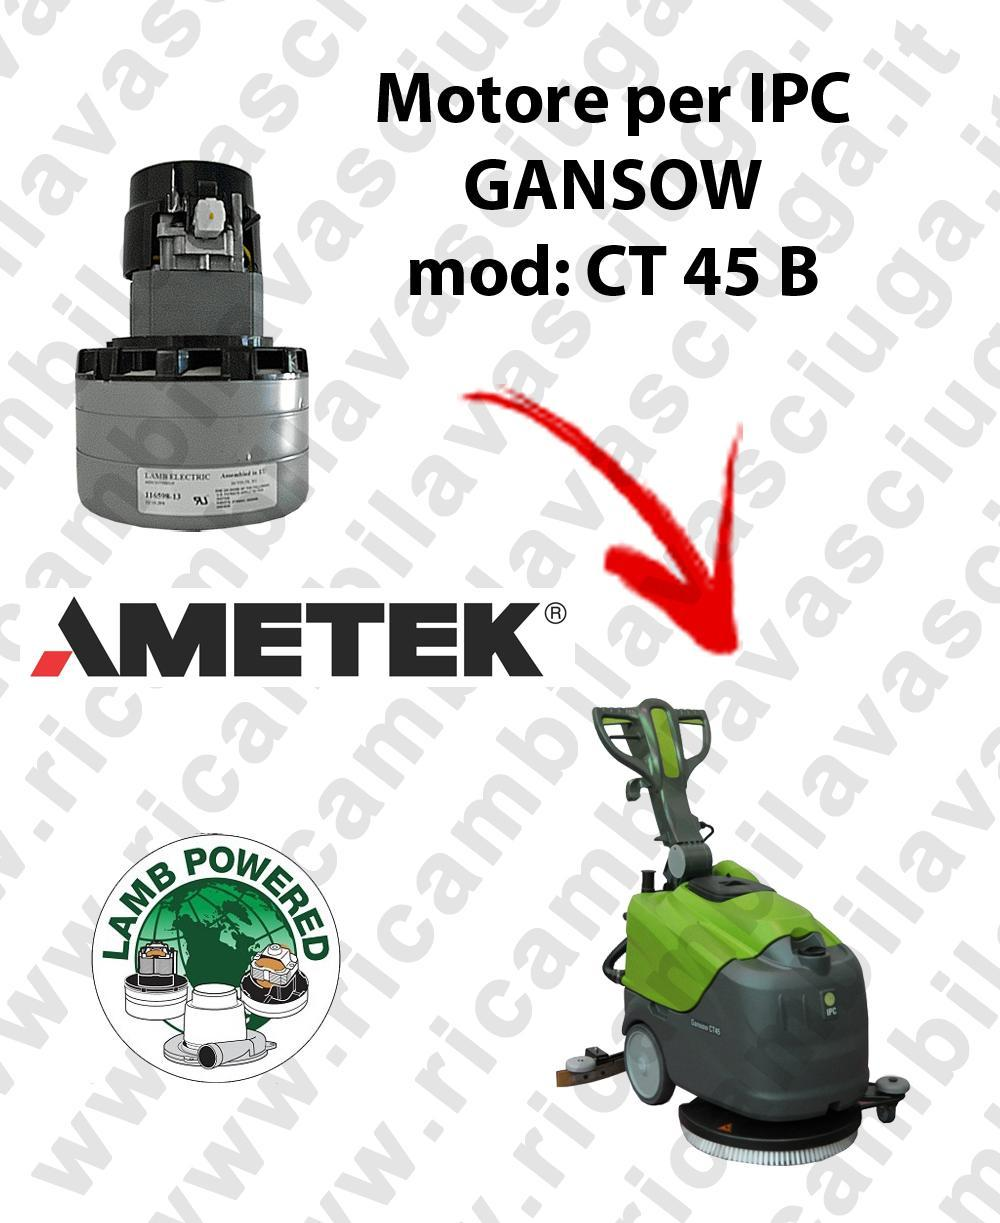 CT 45 B LAMB AMETEK vacuum motor for scrubber dryer IPC GANSOW